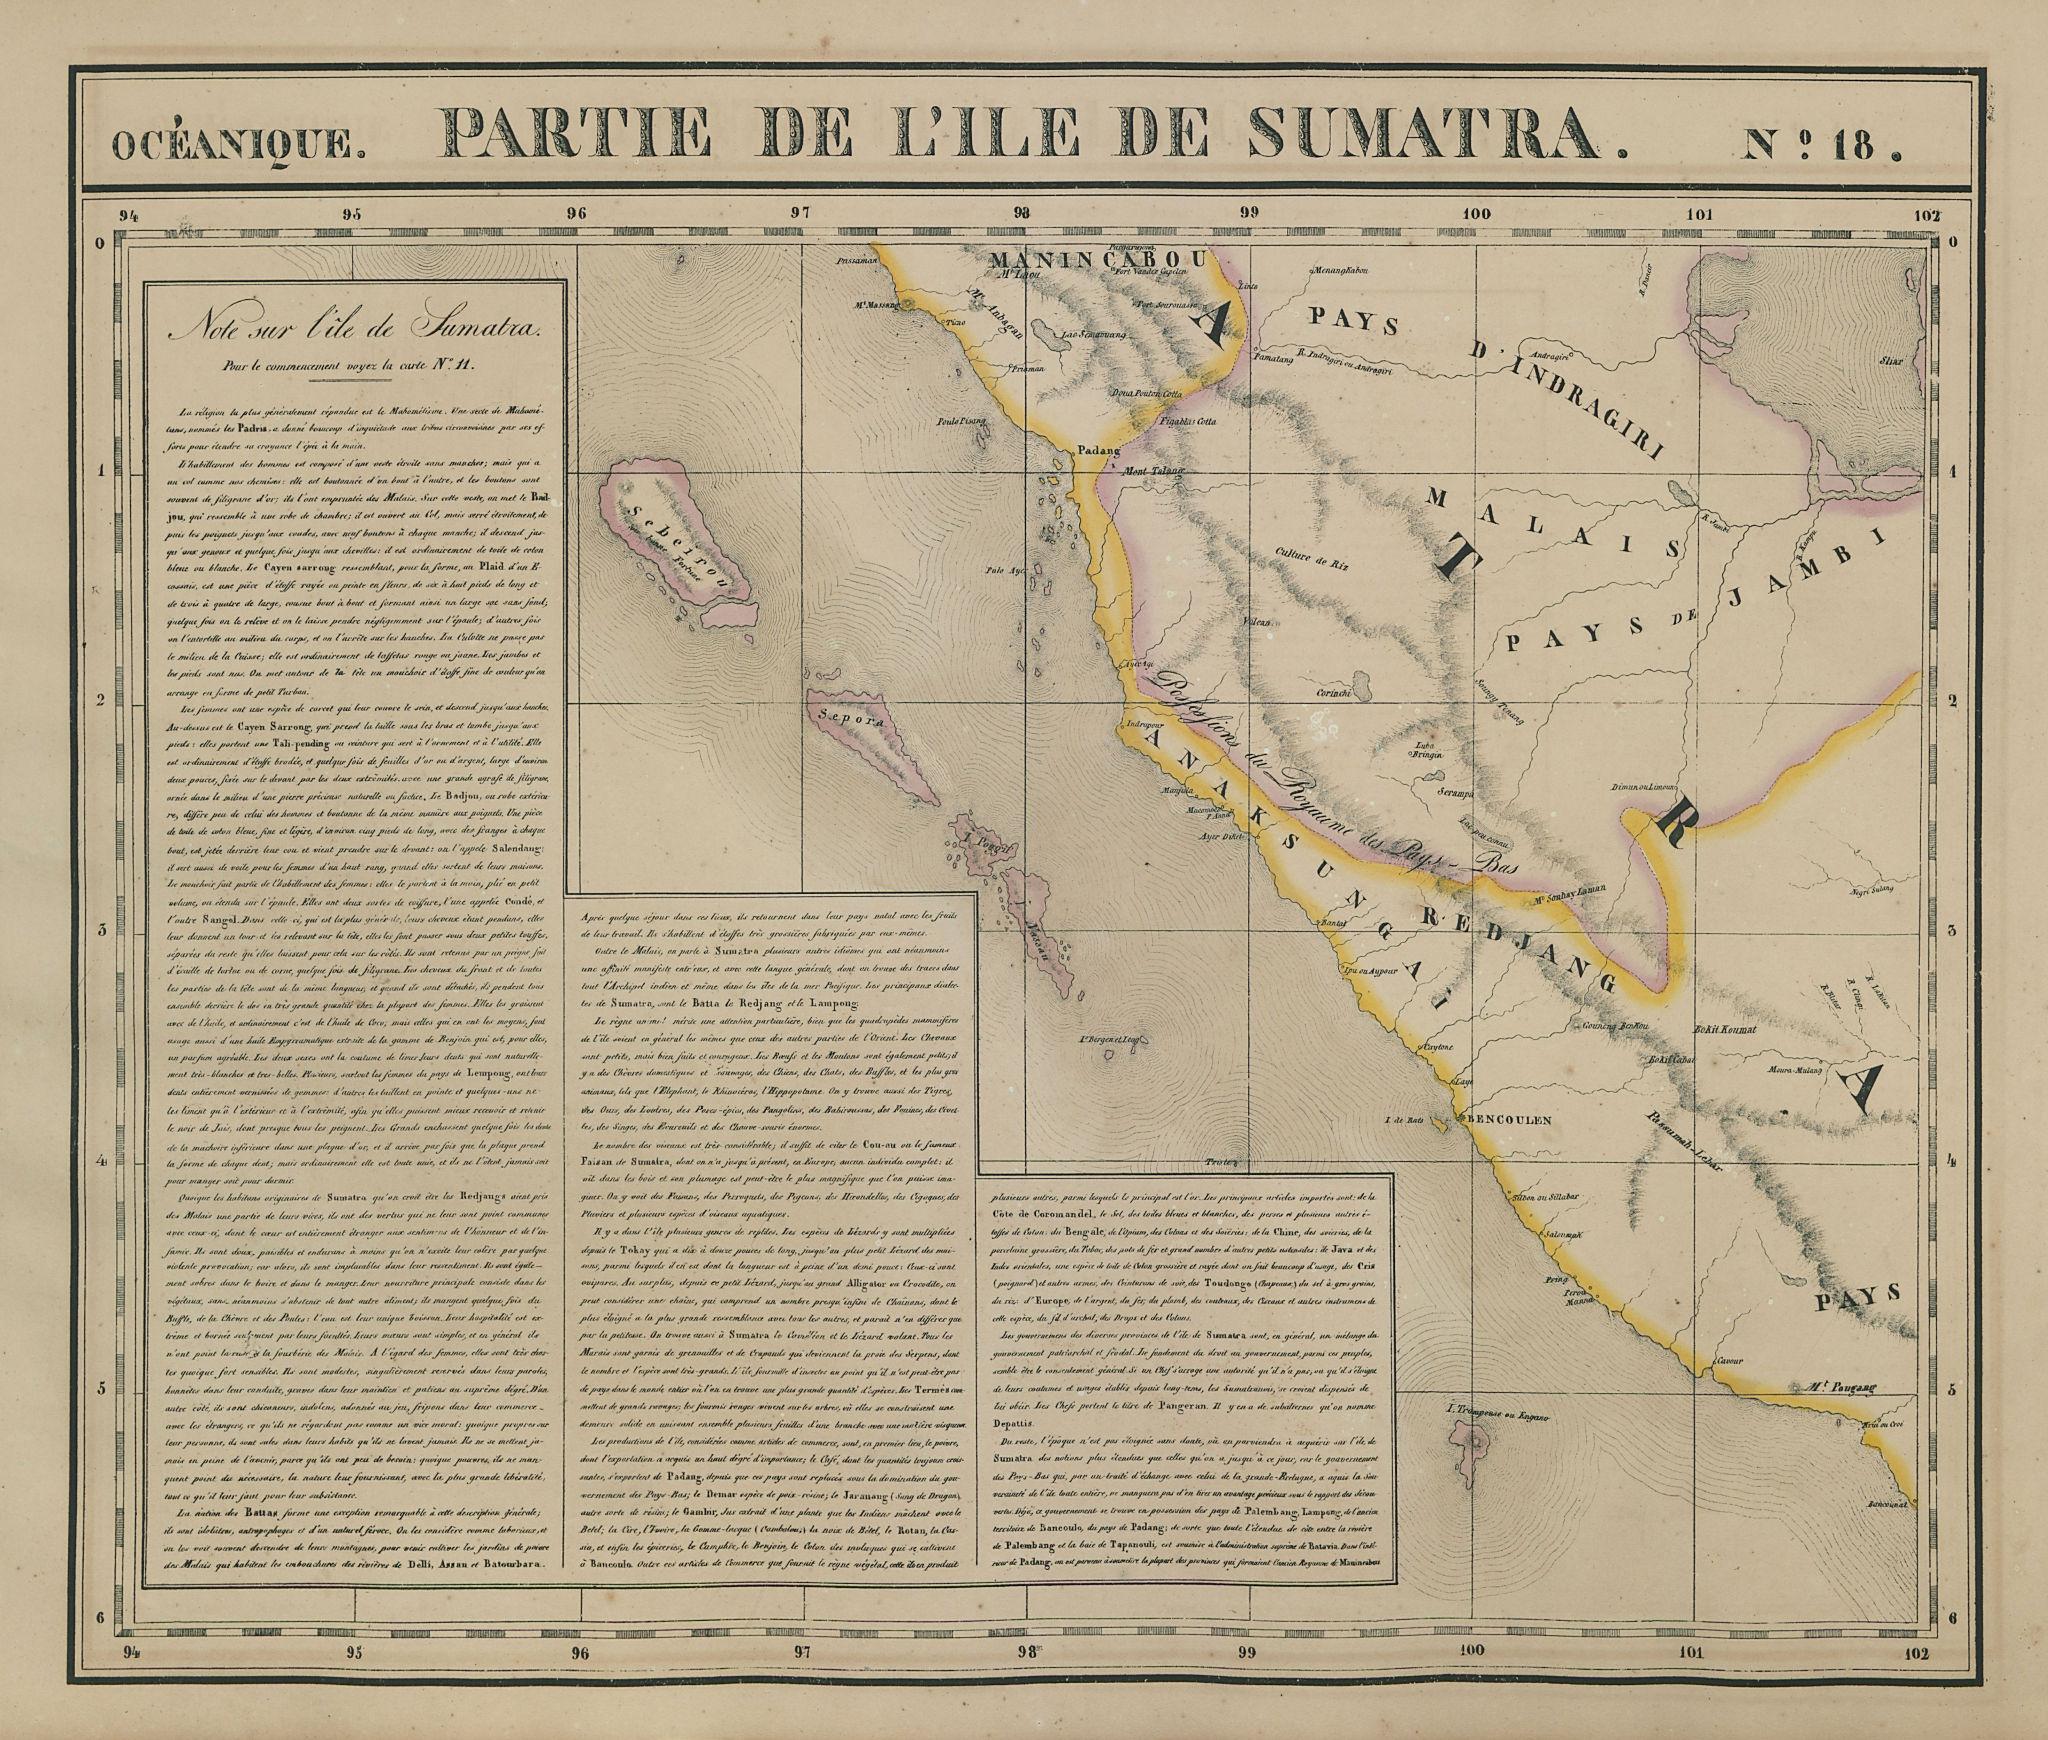 Océanique. Partie de l'ile de Sumatra #18. West Sumatra. VANDERMAELEN 1827 map